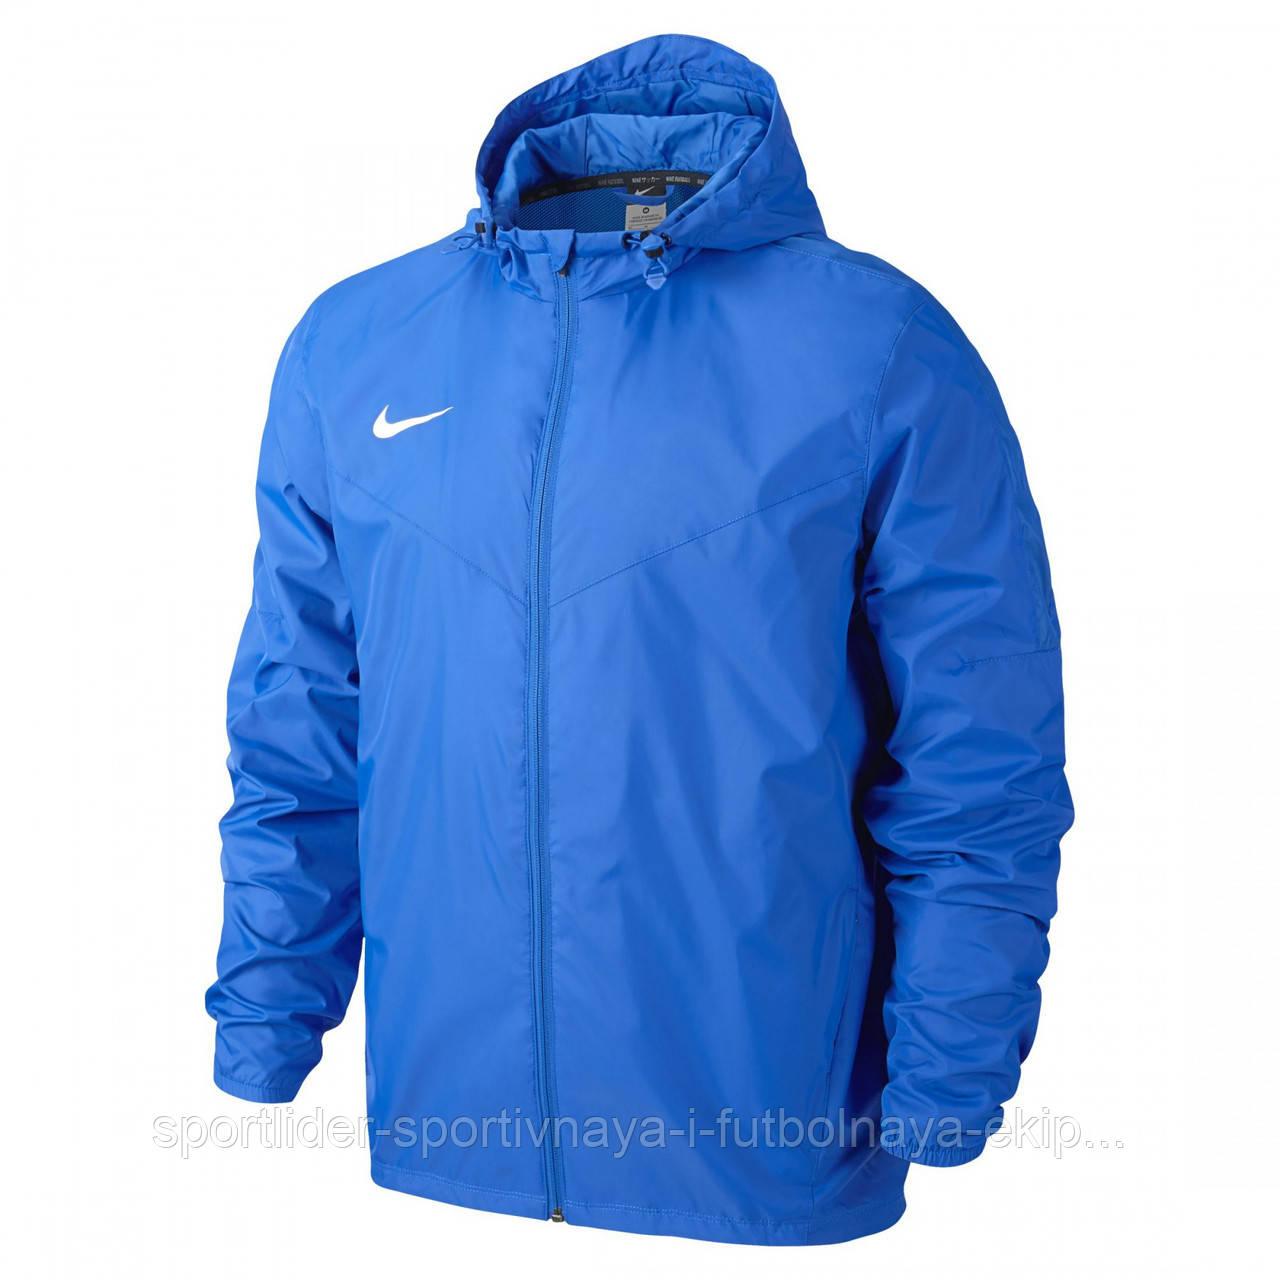 e507c520 Детская куртка Nike Team Sideline Rain Jacket 645908-463 - Sport-Leader в  Киеве